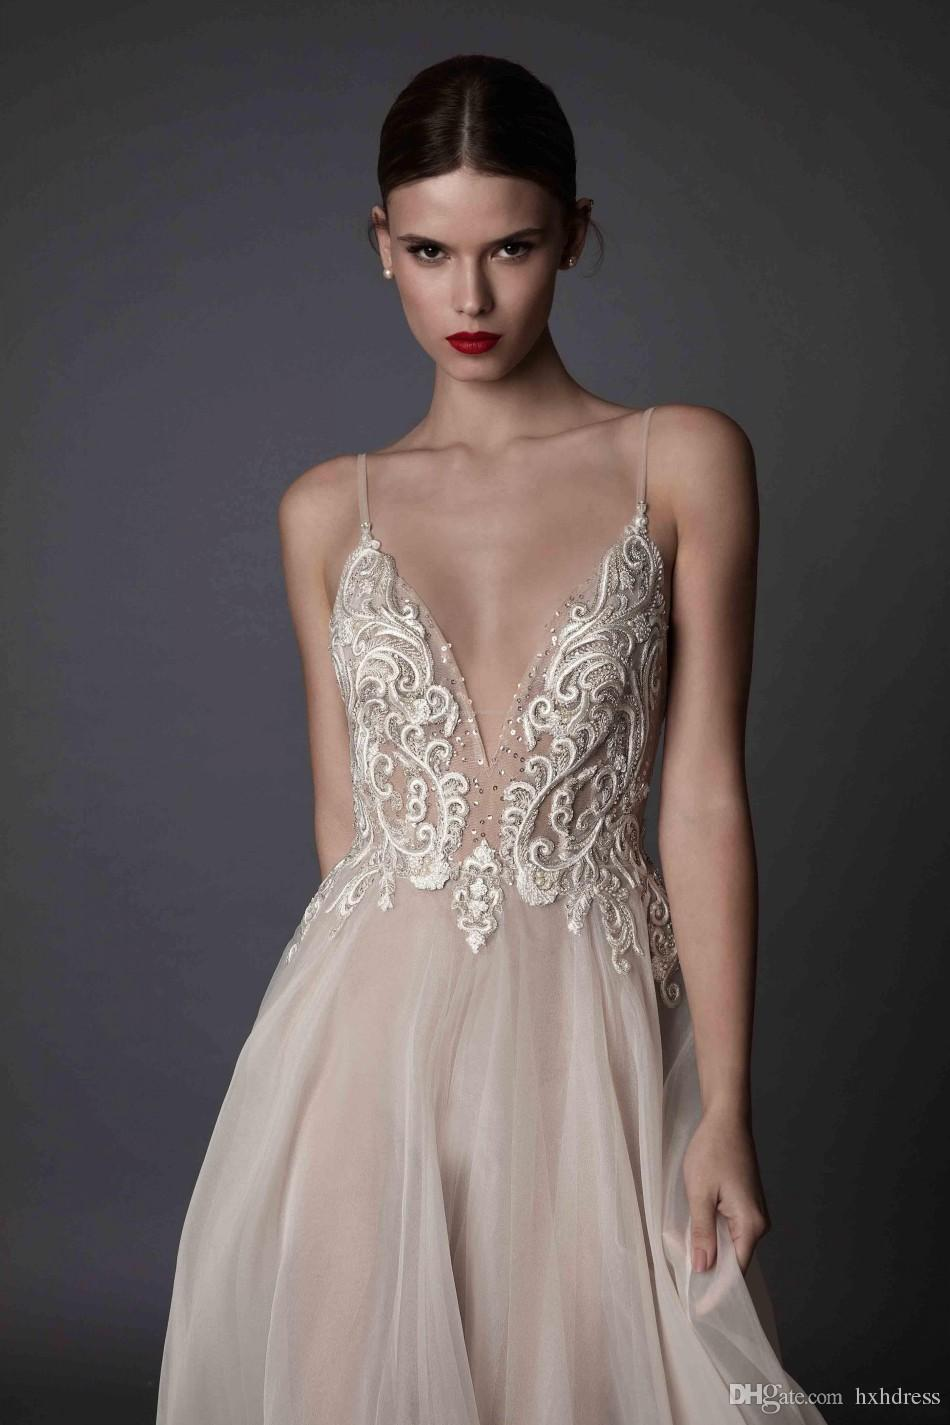 2018 New Deep V Neck Spaghetti Straps Embroidered Chiffon Backless Summer Illusion Long Prom Dresses Ivory Berta Evening Dresses 235